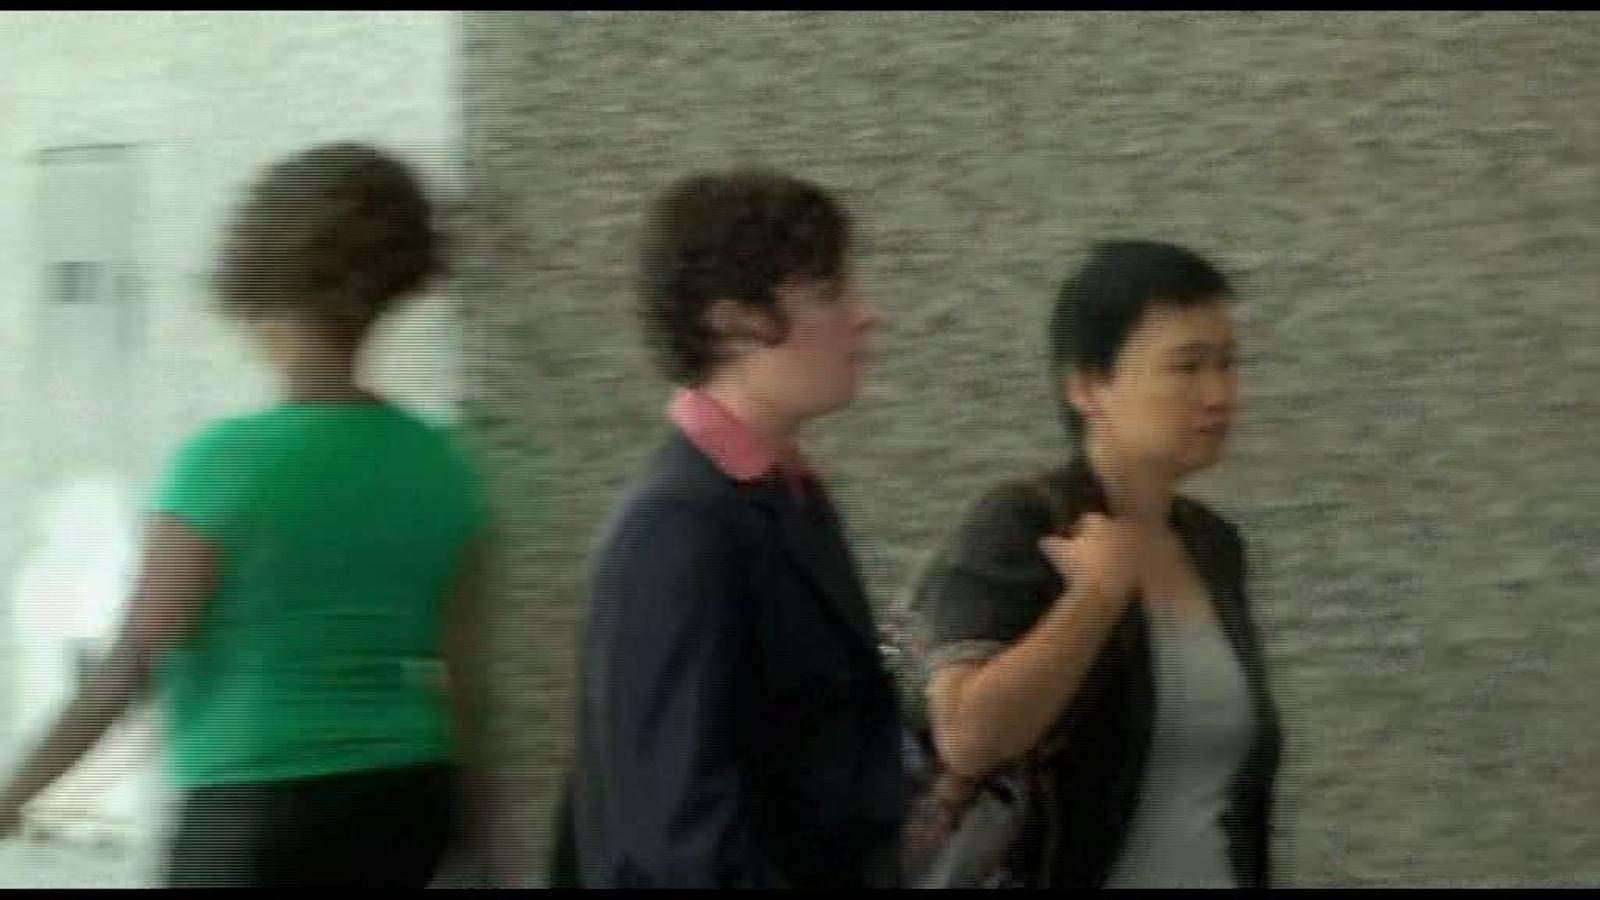 Condemnen a quatre anys de presó una treballadora de Motorola